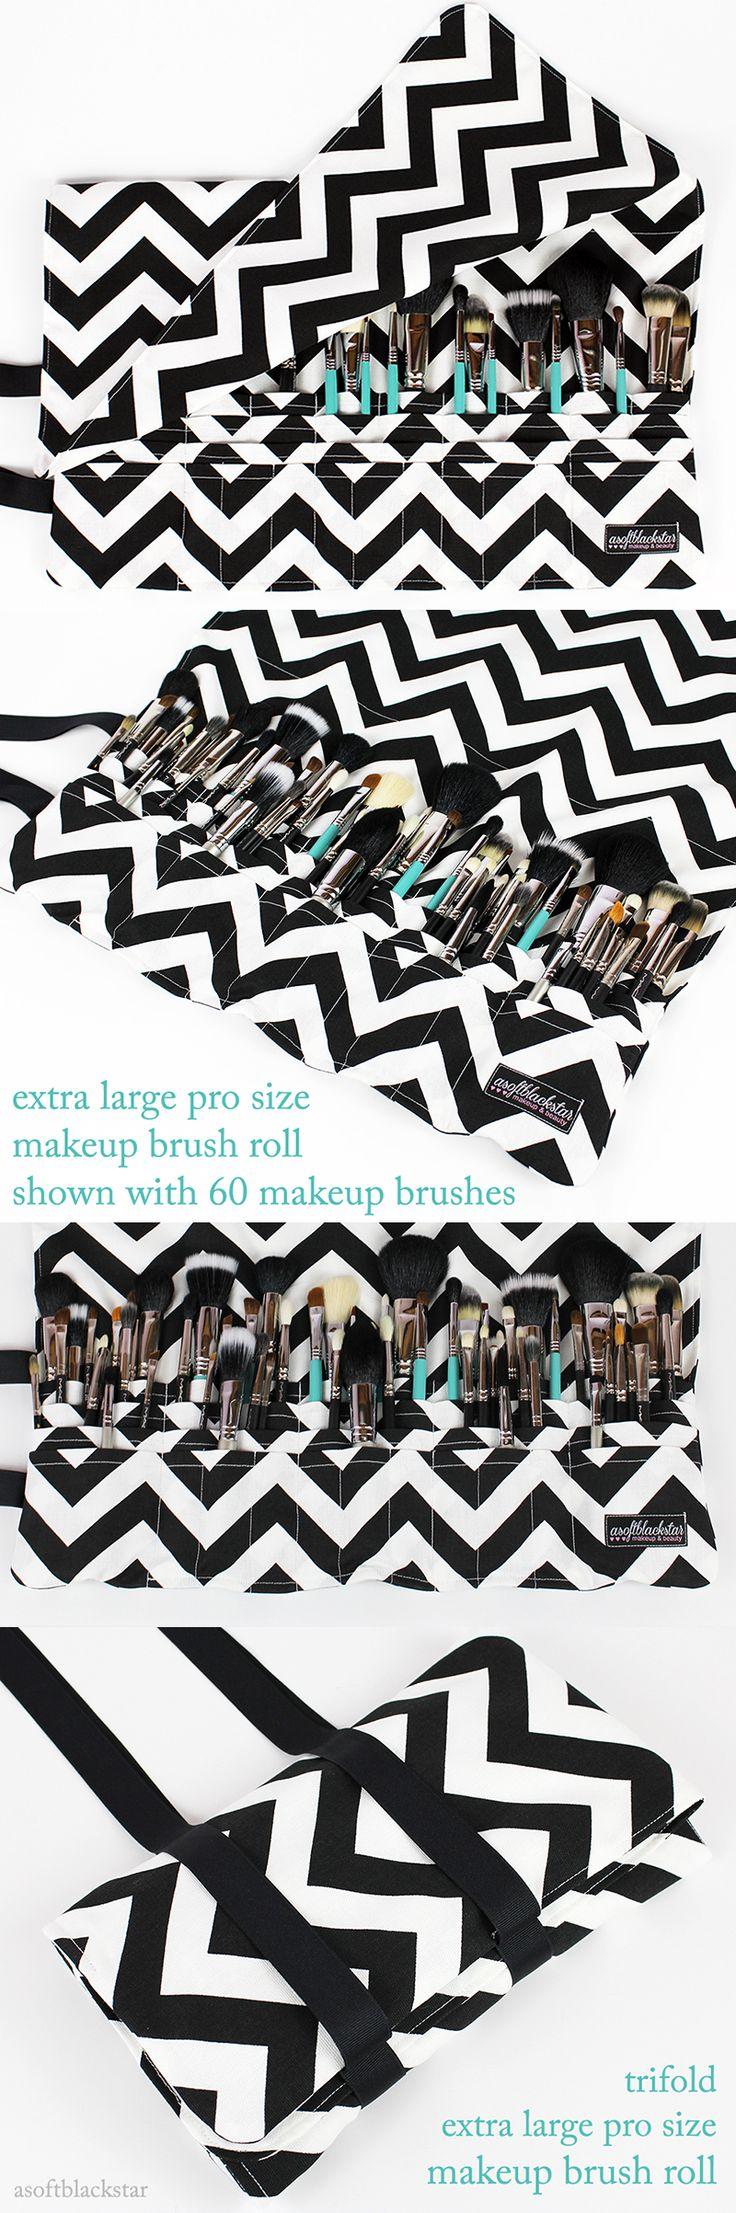 CUSTOM makeup brush roll Extra Large Pro Size - chevron print